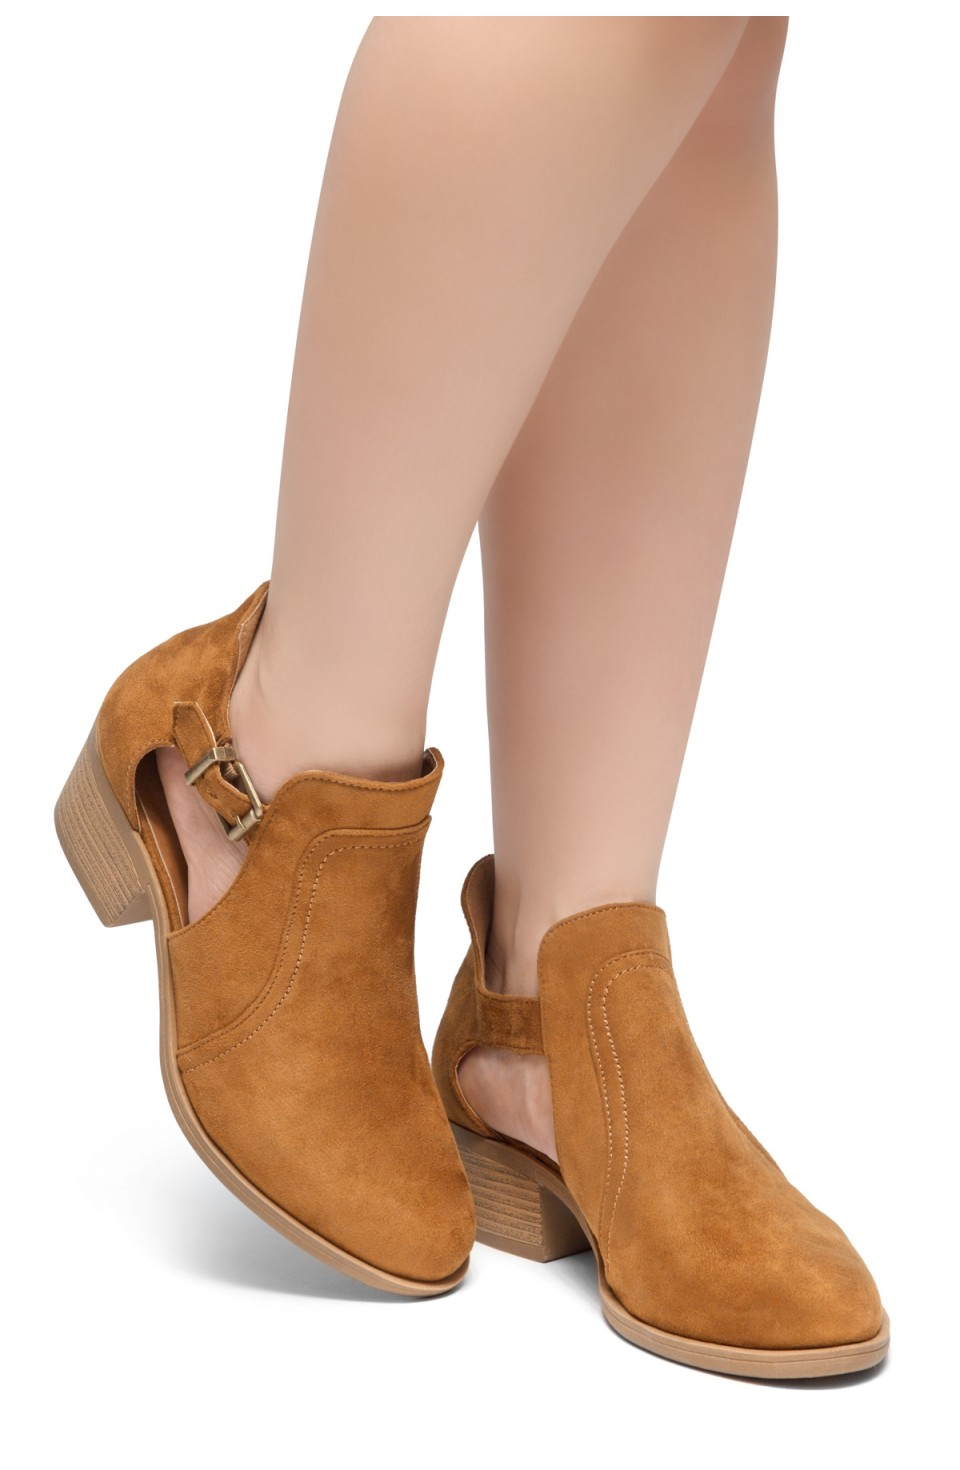 HerStyle Prisila-Stacked Heel Almond Toe Booties (Cognac)